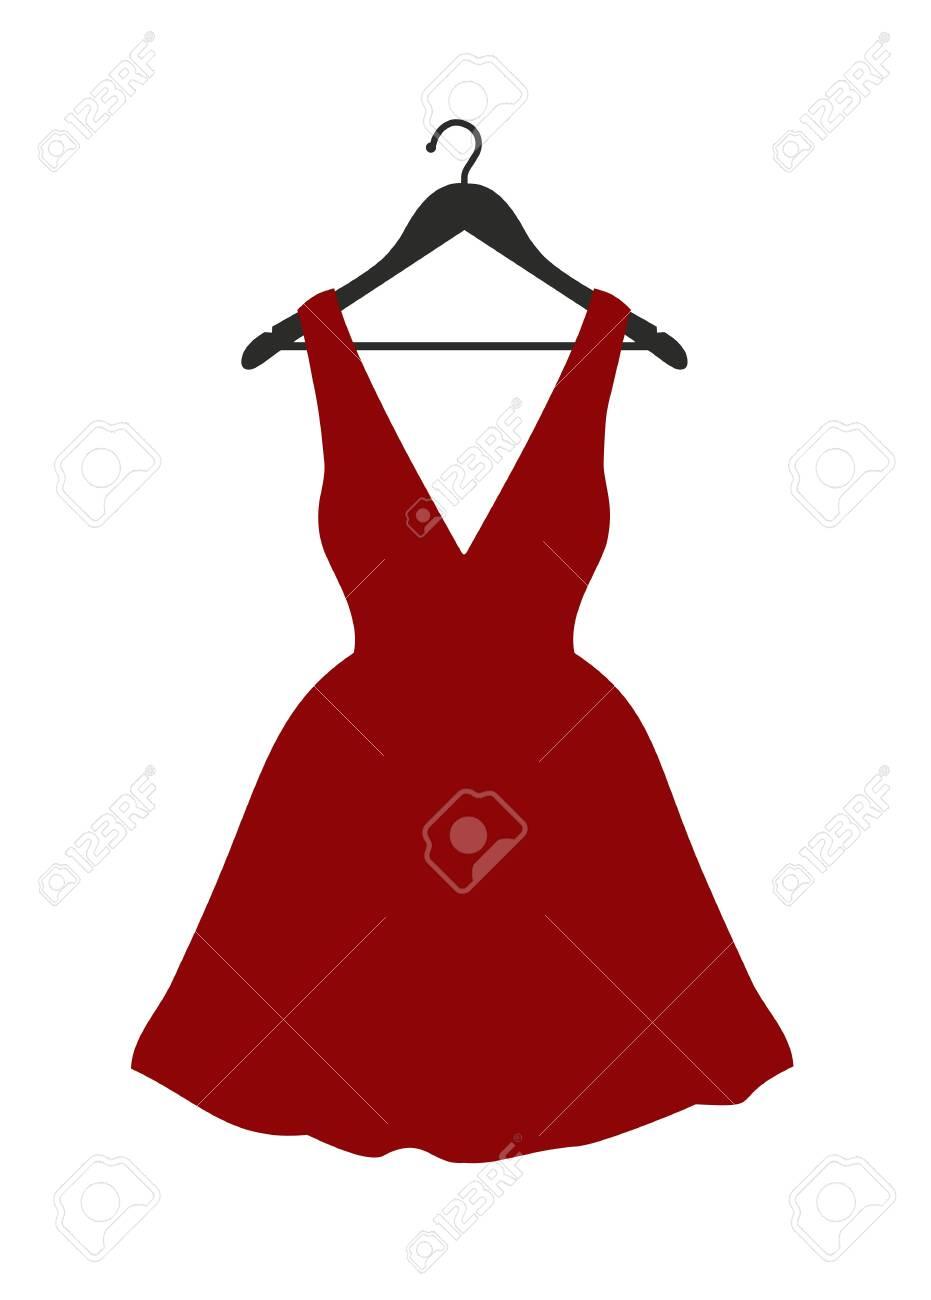 Vector illustration of little red dress hanging on black clothes hanger over white - 132124374